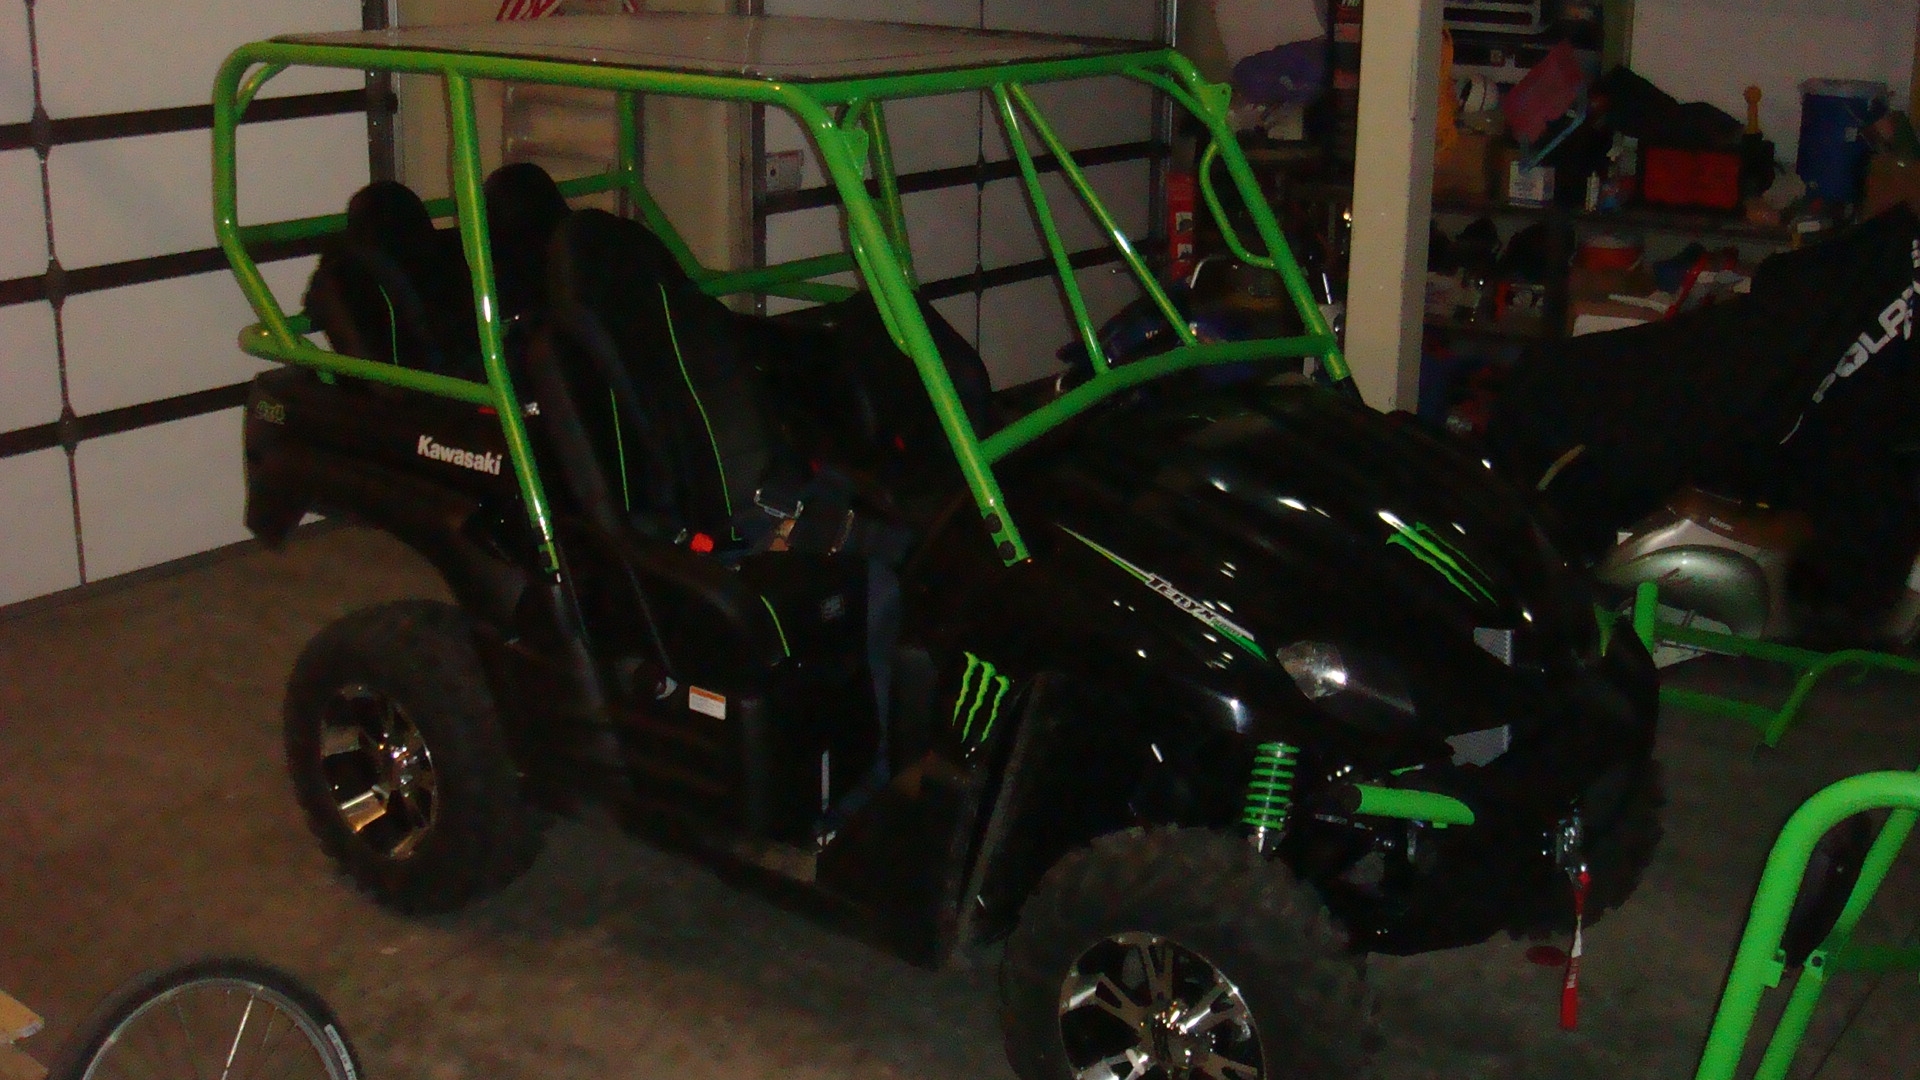 2009 Loaded Monster For Sale Kawasaki Teryx Forums